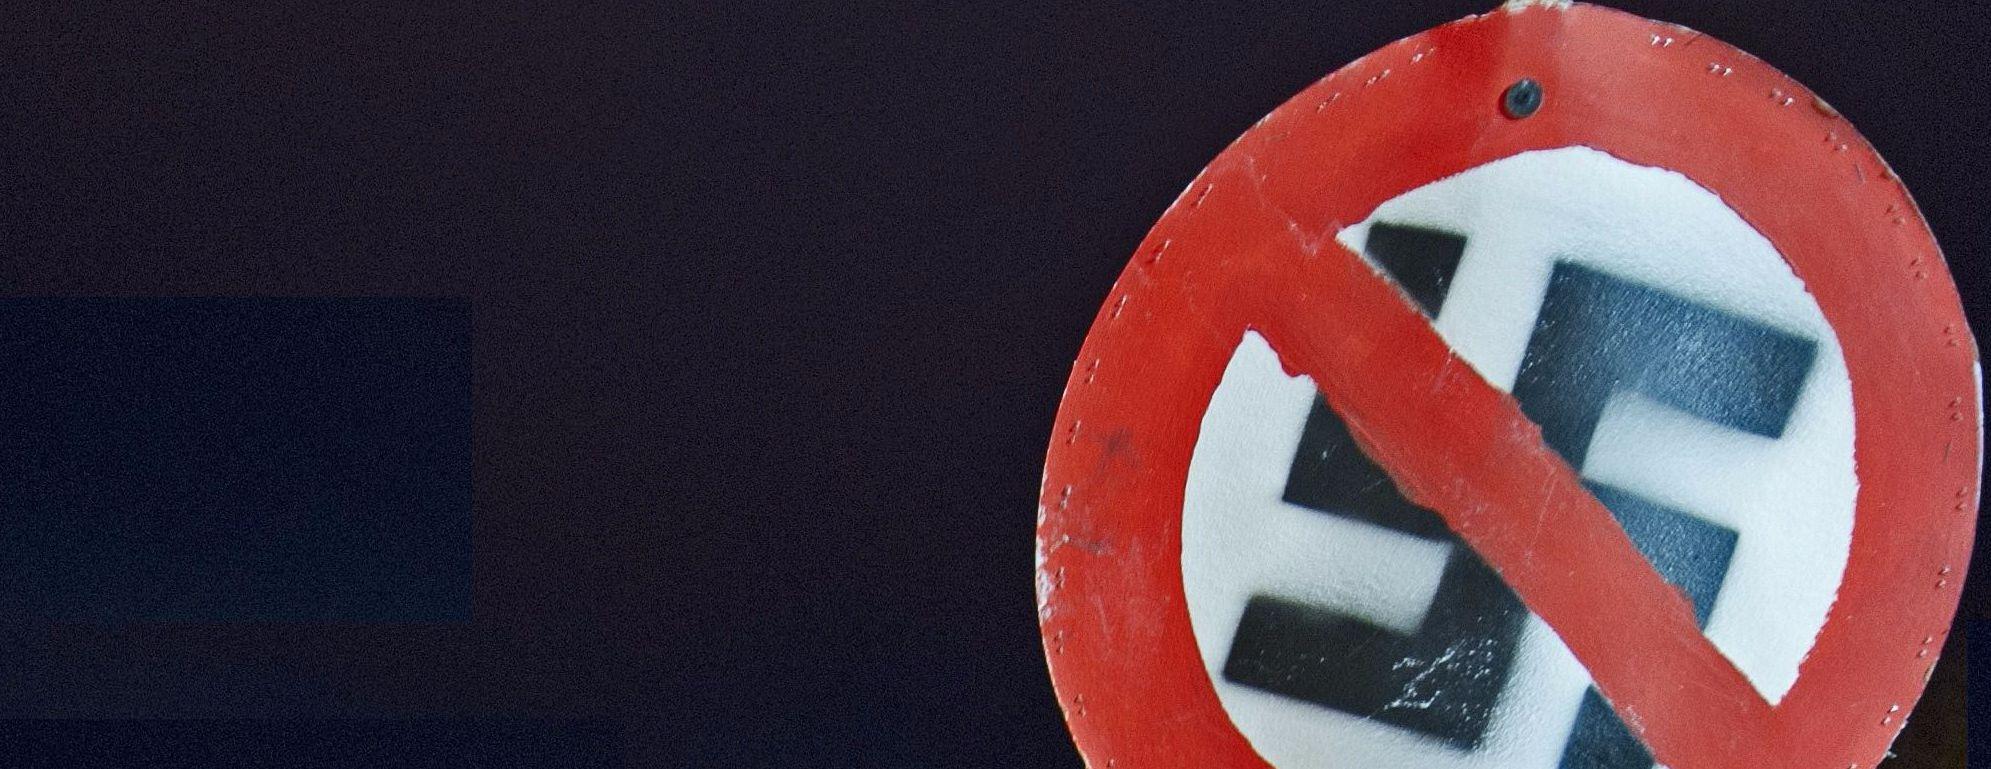 Swastika (generic)